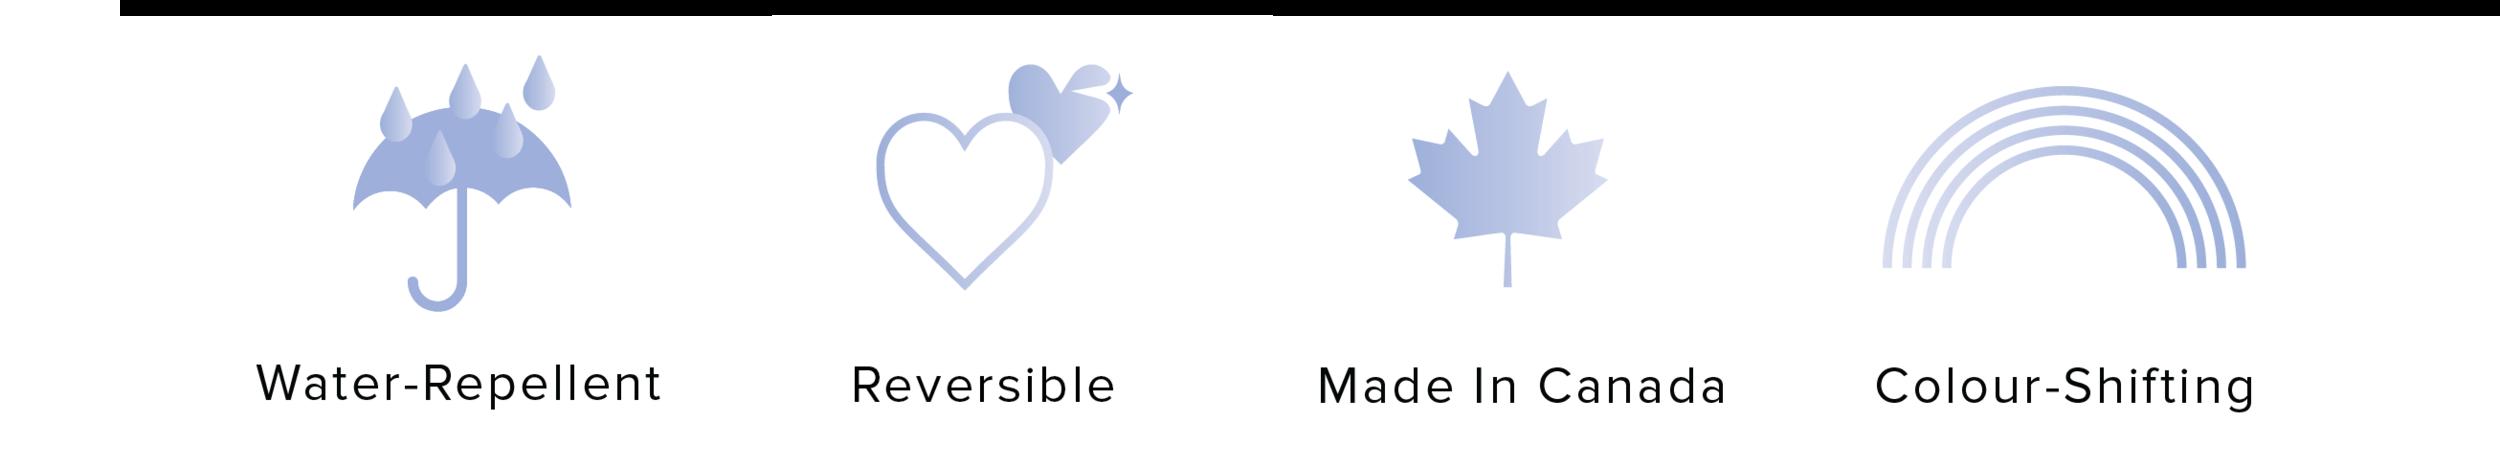 emojis-group-northernlights-06.png